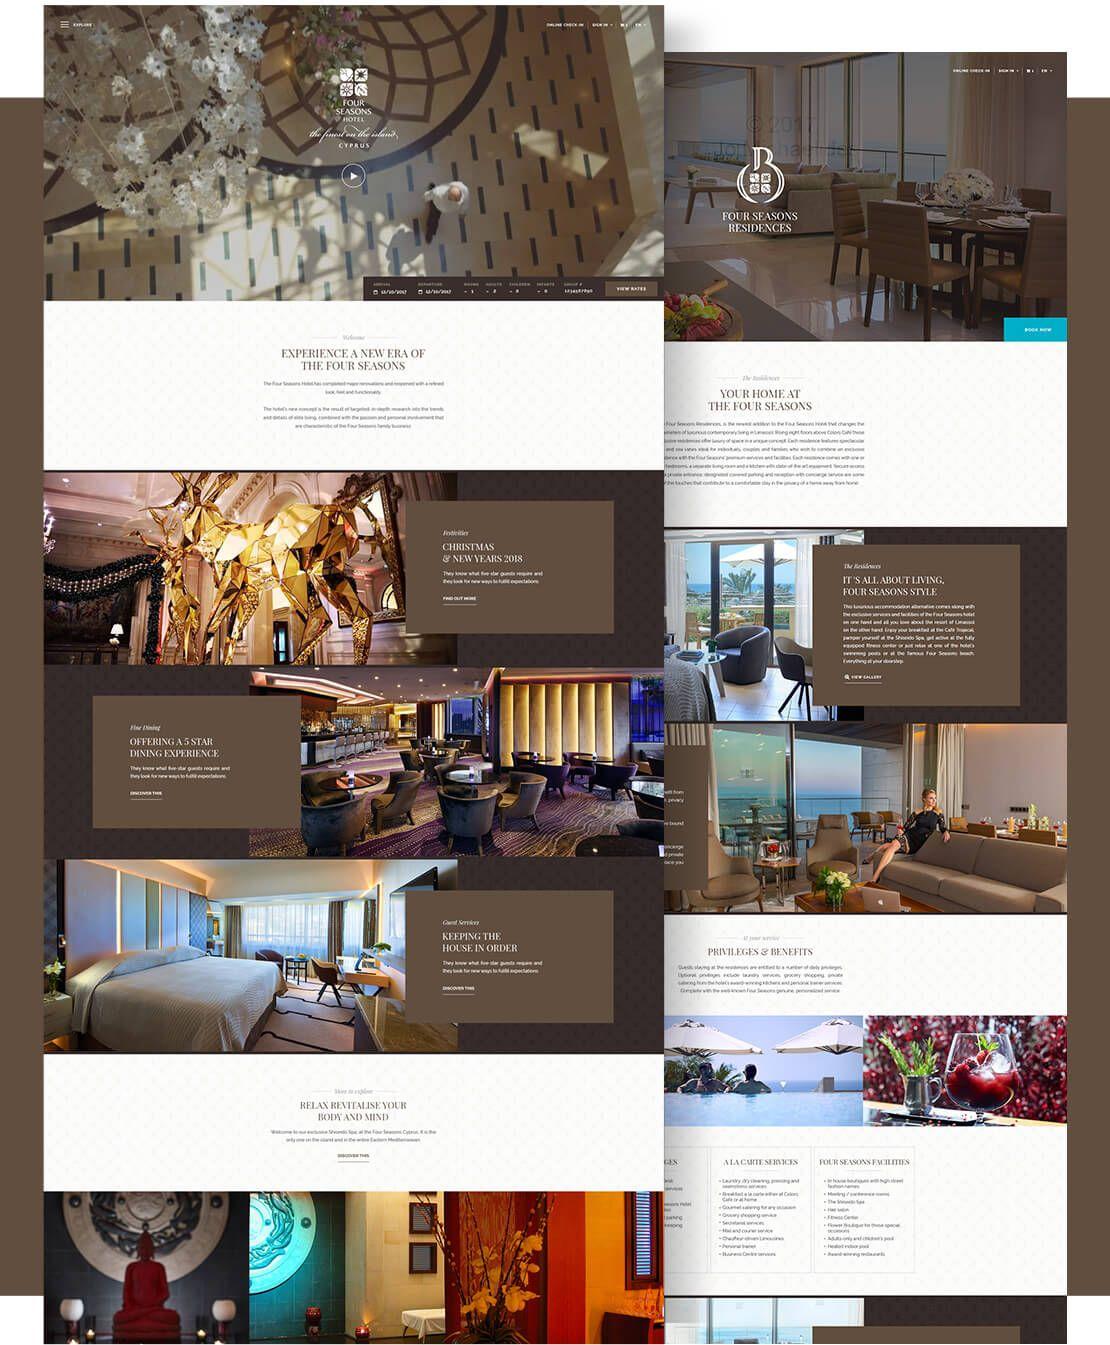 Web Design Cyprus Web Design News Web Design Design